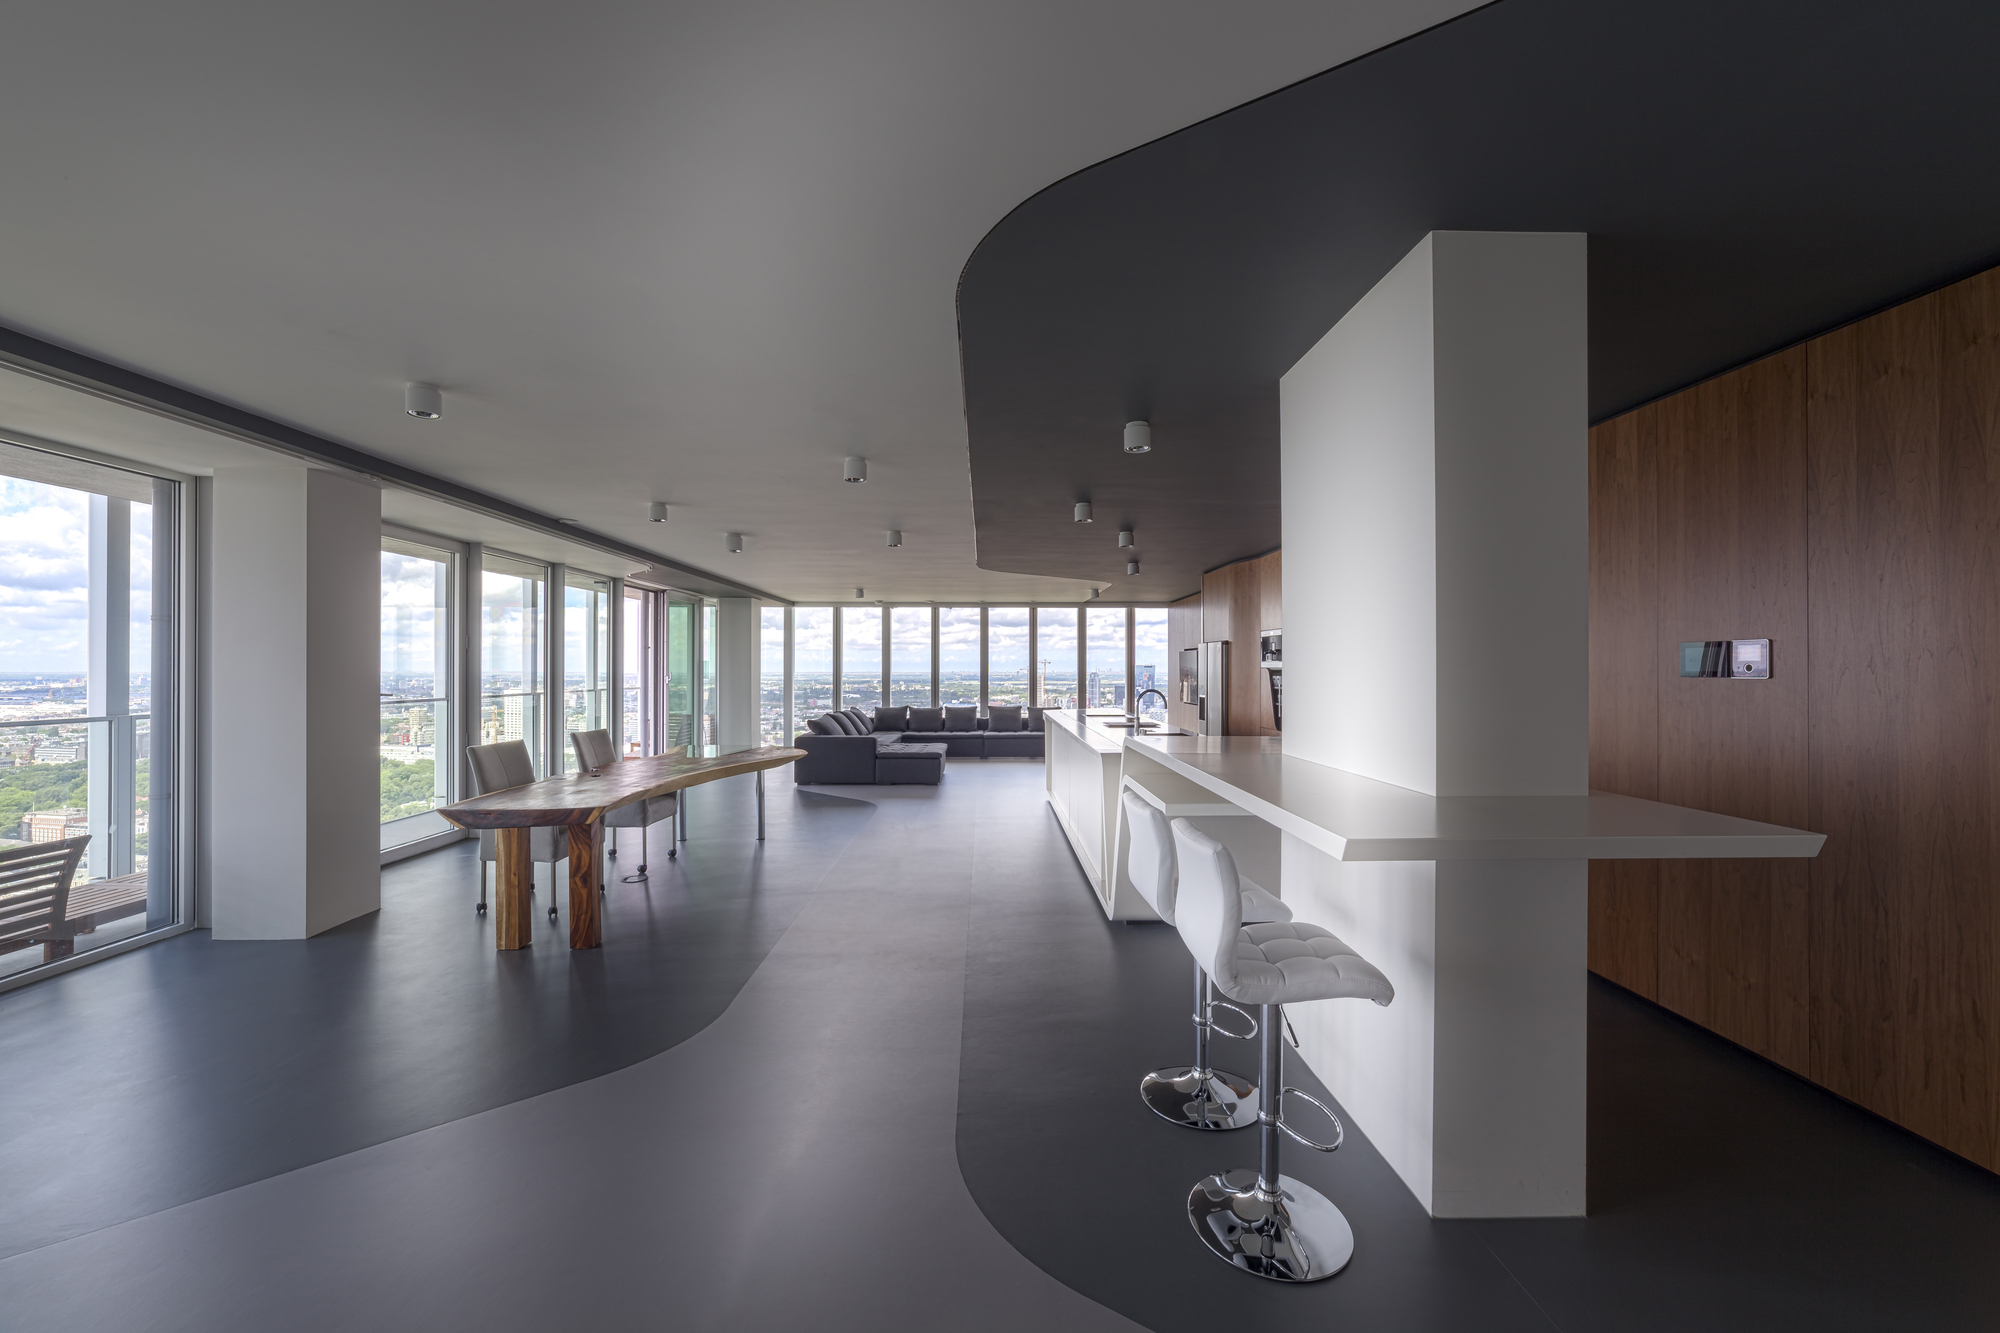 de rotterdam suite 123dv archdaily. Black Bedroom Furniture Sets. Home Design Ideas